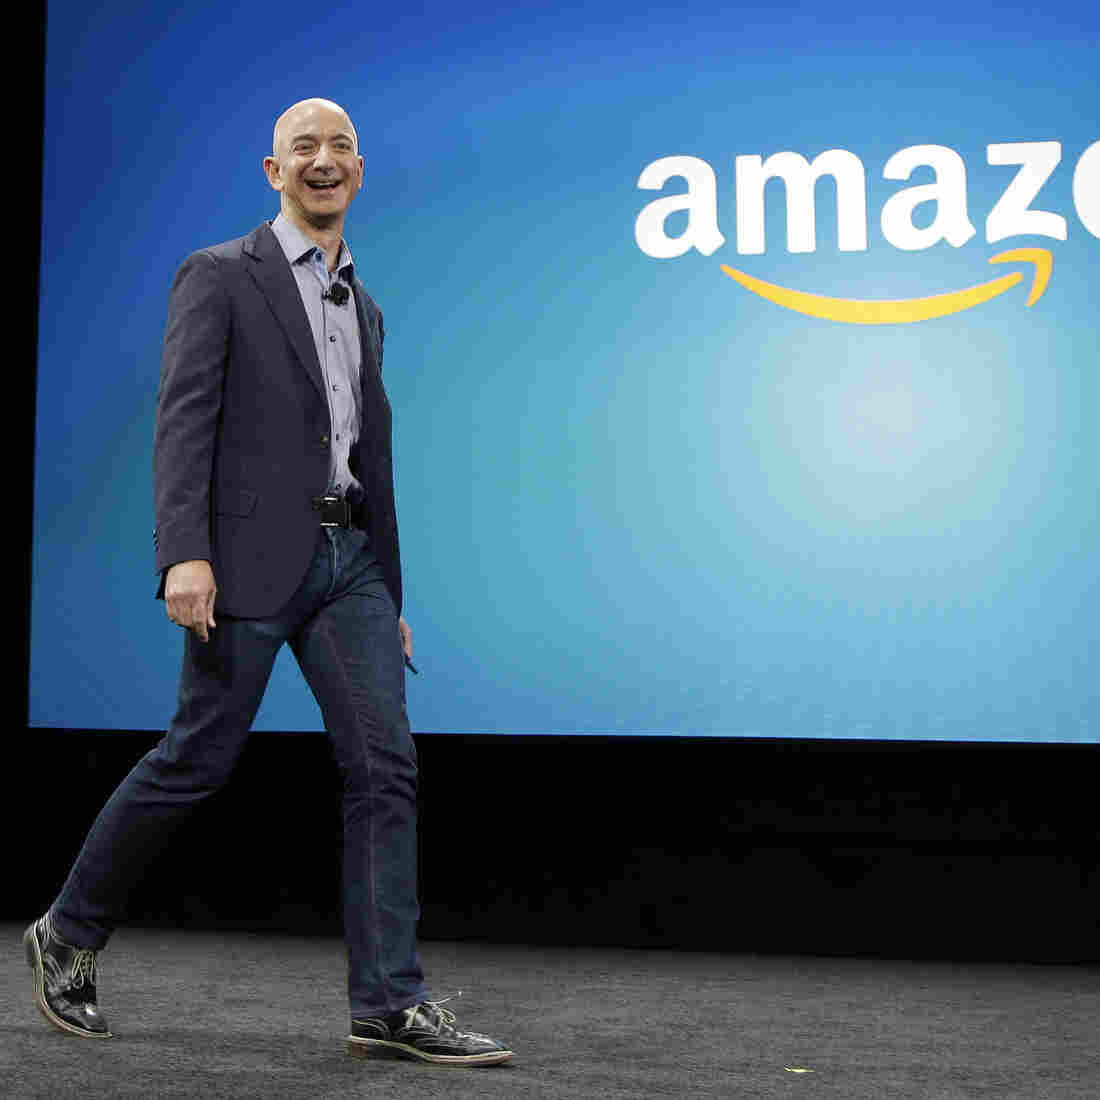 Jeff Bezos Responds To 'New York Times' Report On Amazon's Workplace